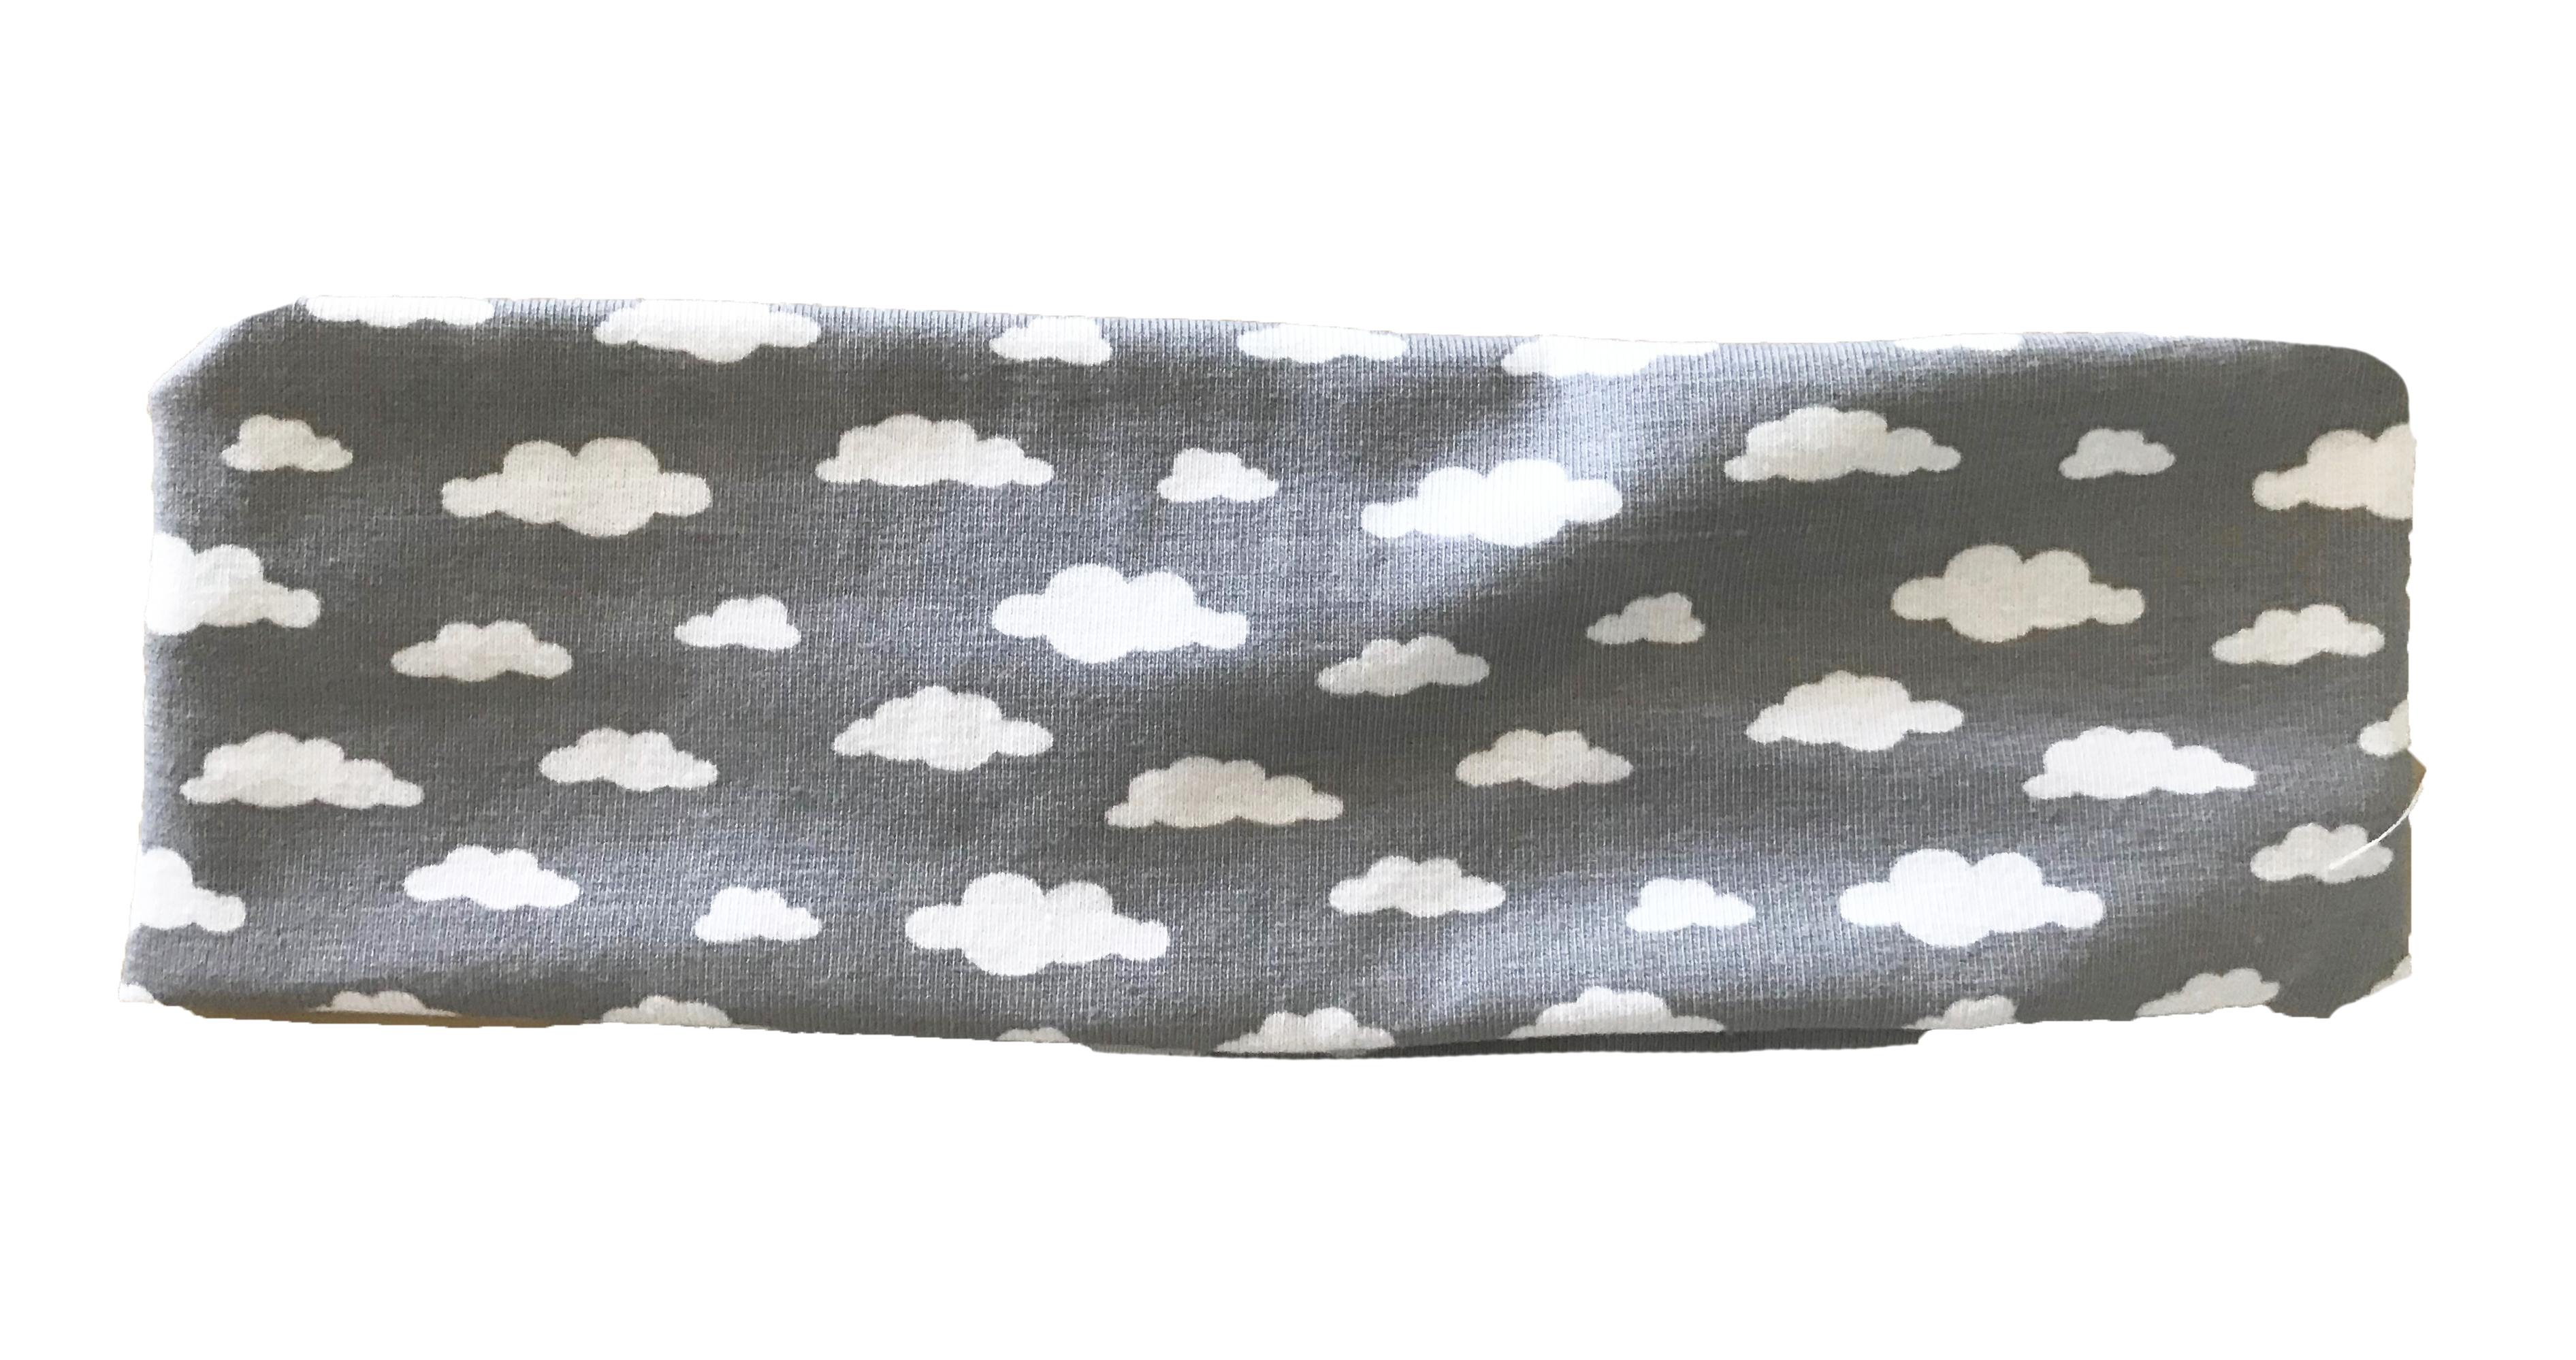 Fascia per i capelli - Nuvole